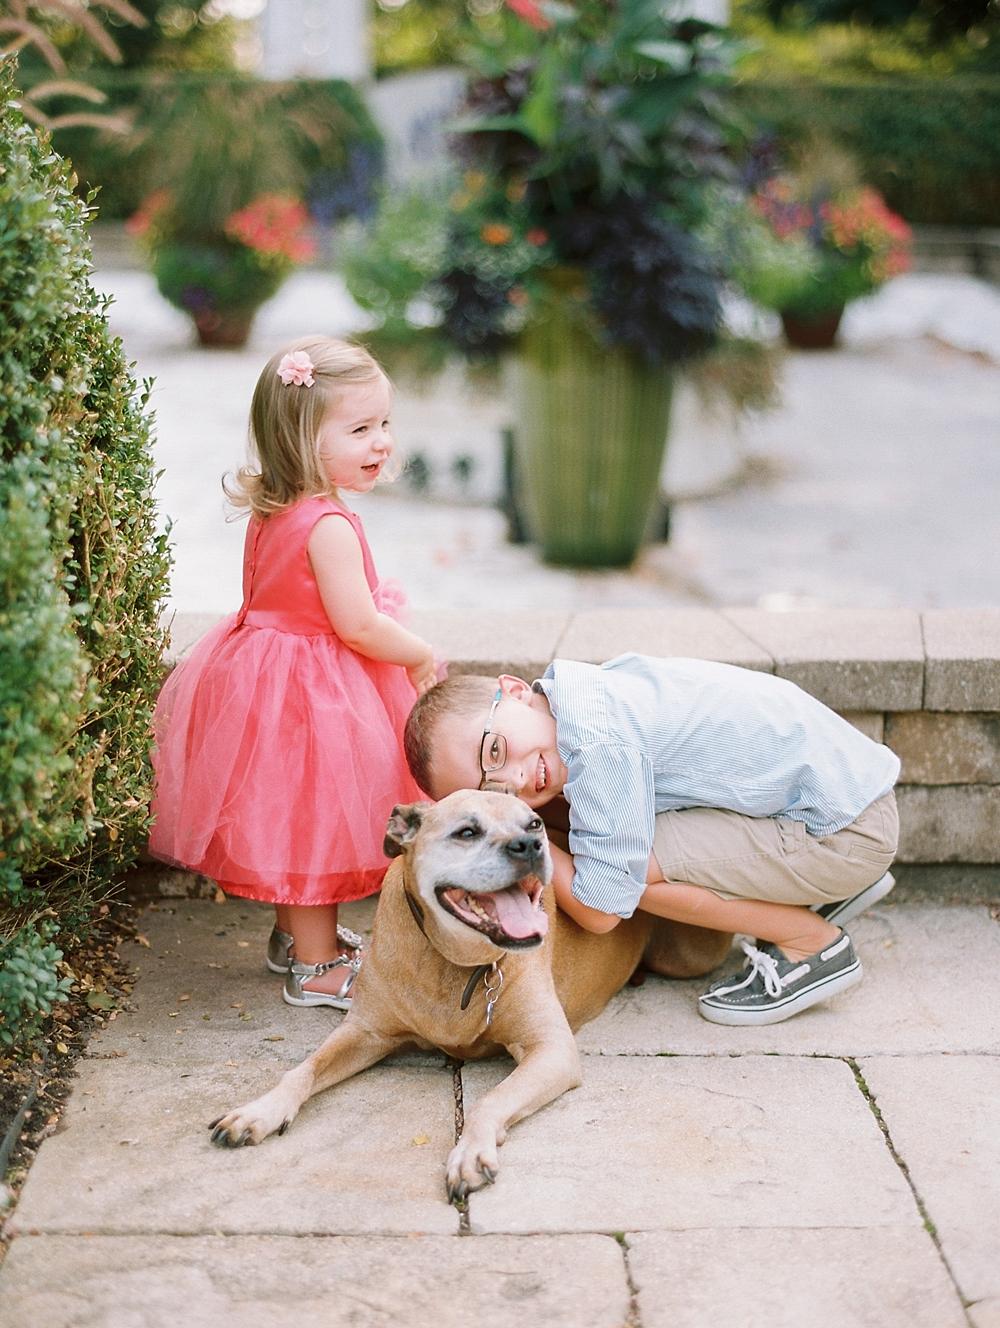 kristin-la-voie-photography-lifestyle-chicago-dog-2